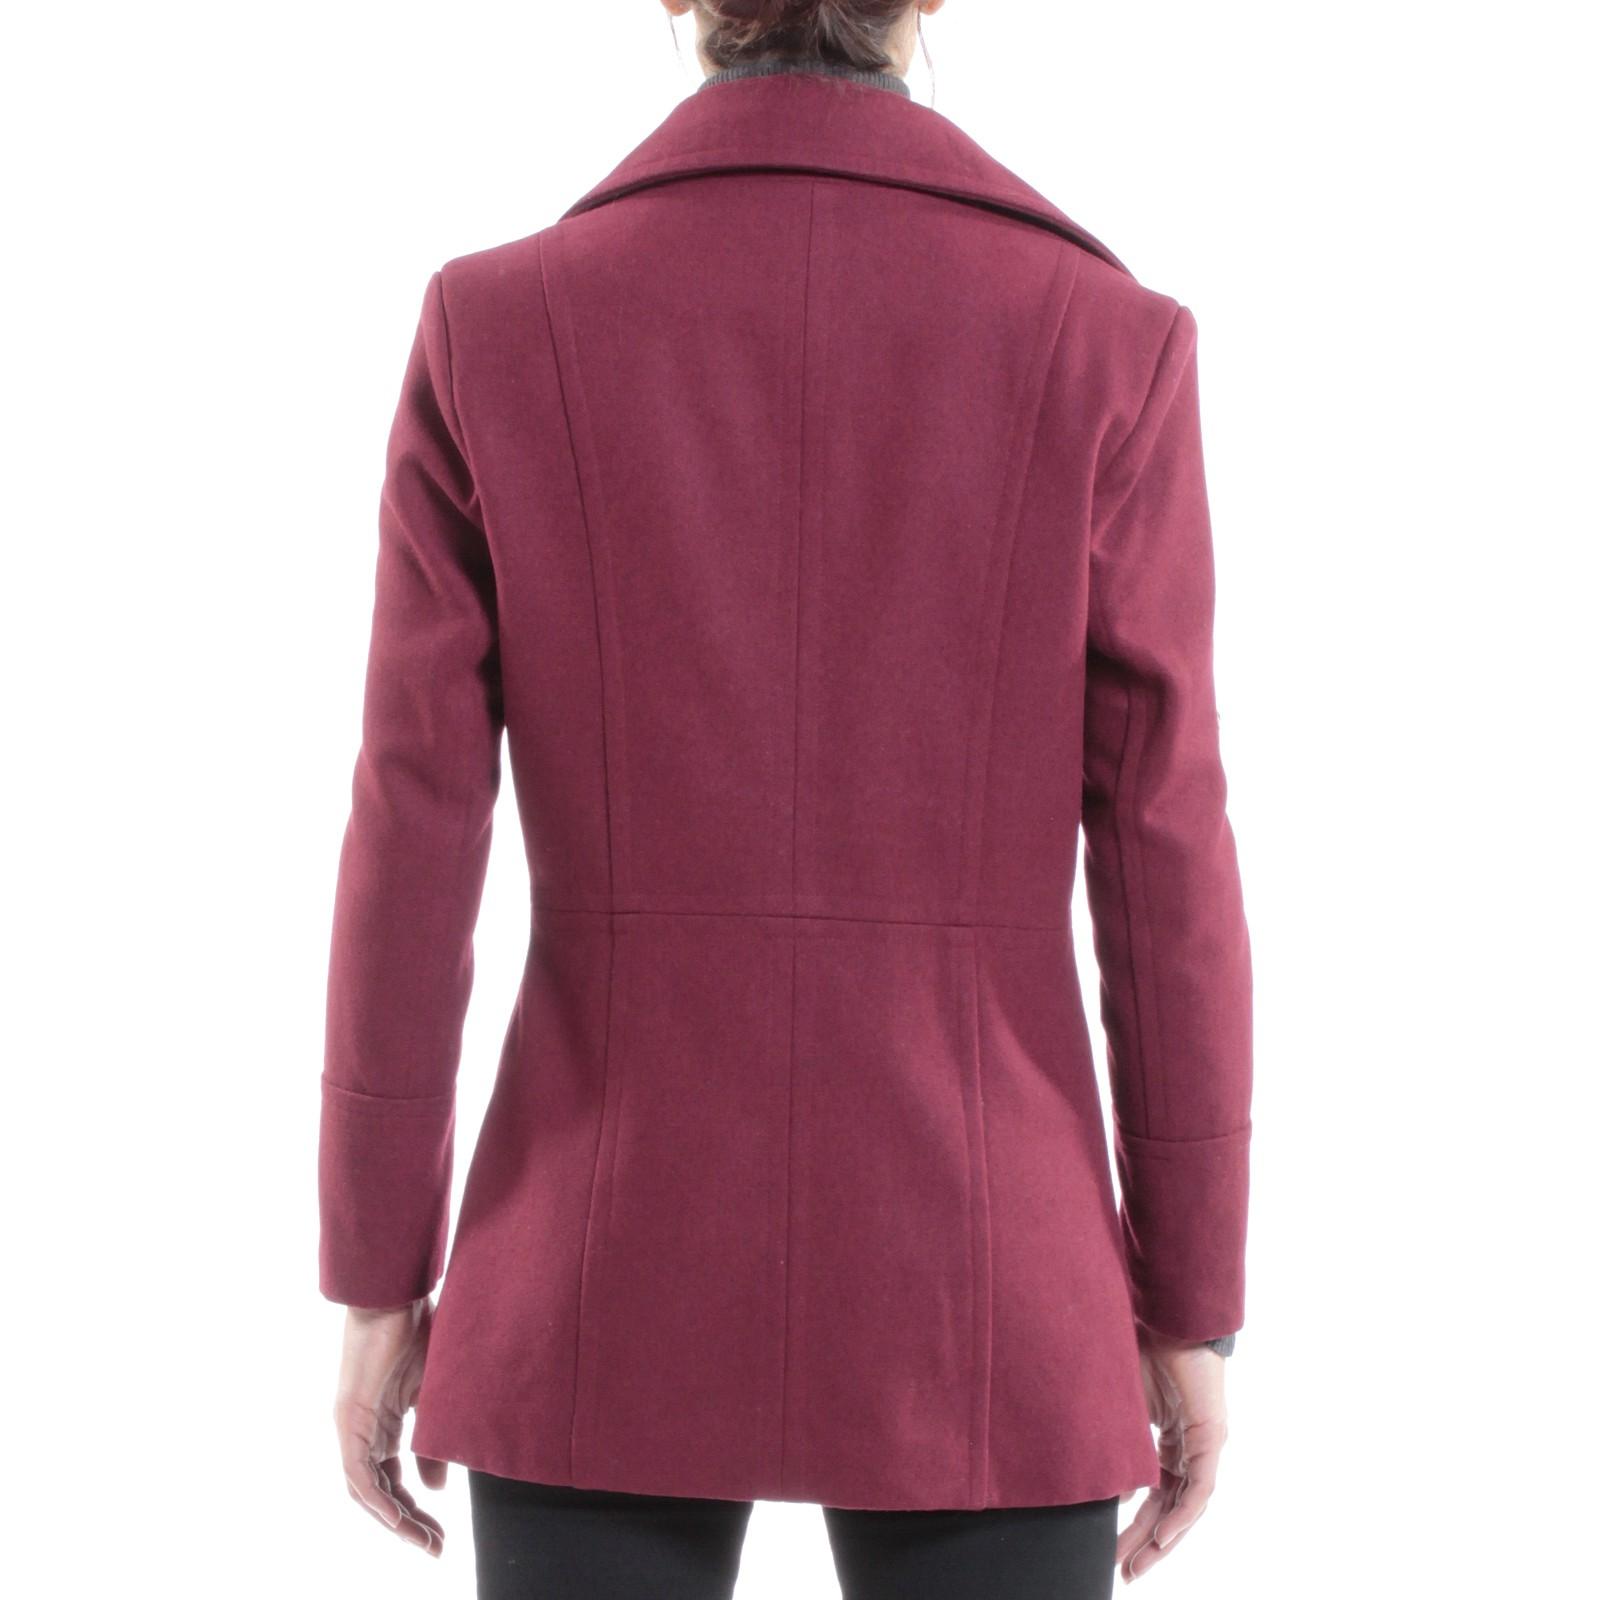 Alpine-Swiss-Emma-Womens-Peacoat-Jacket-Wool-Blazer-Double-Breasted-Overcoat-New thumbnail 28